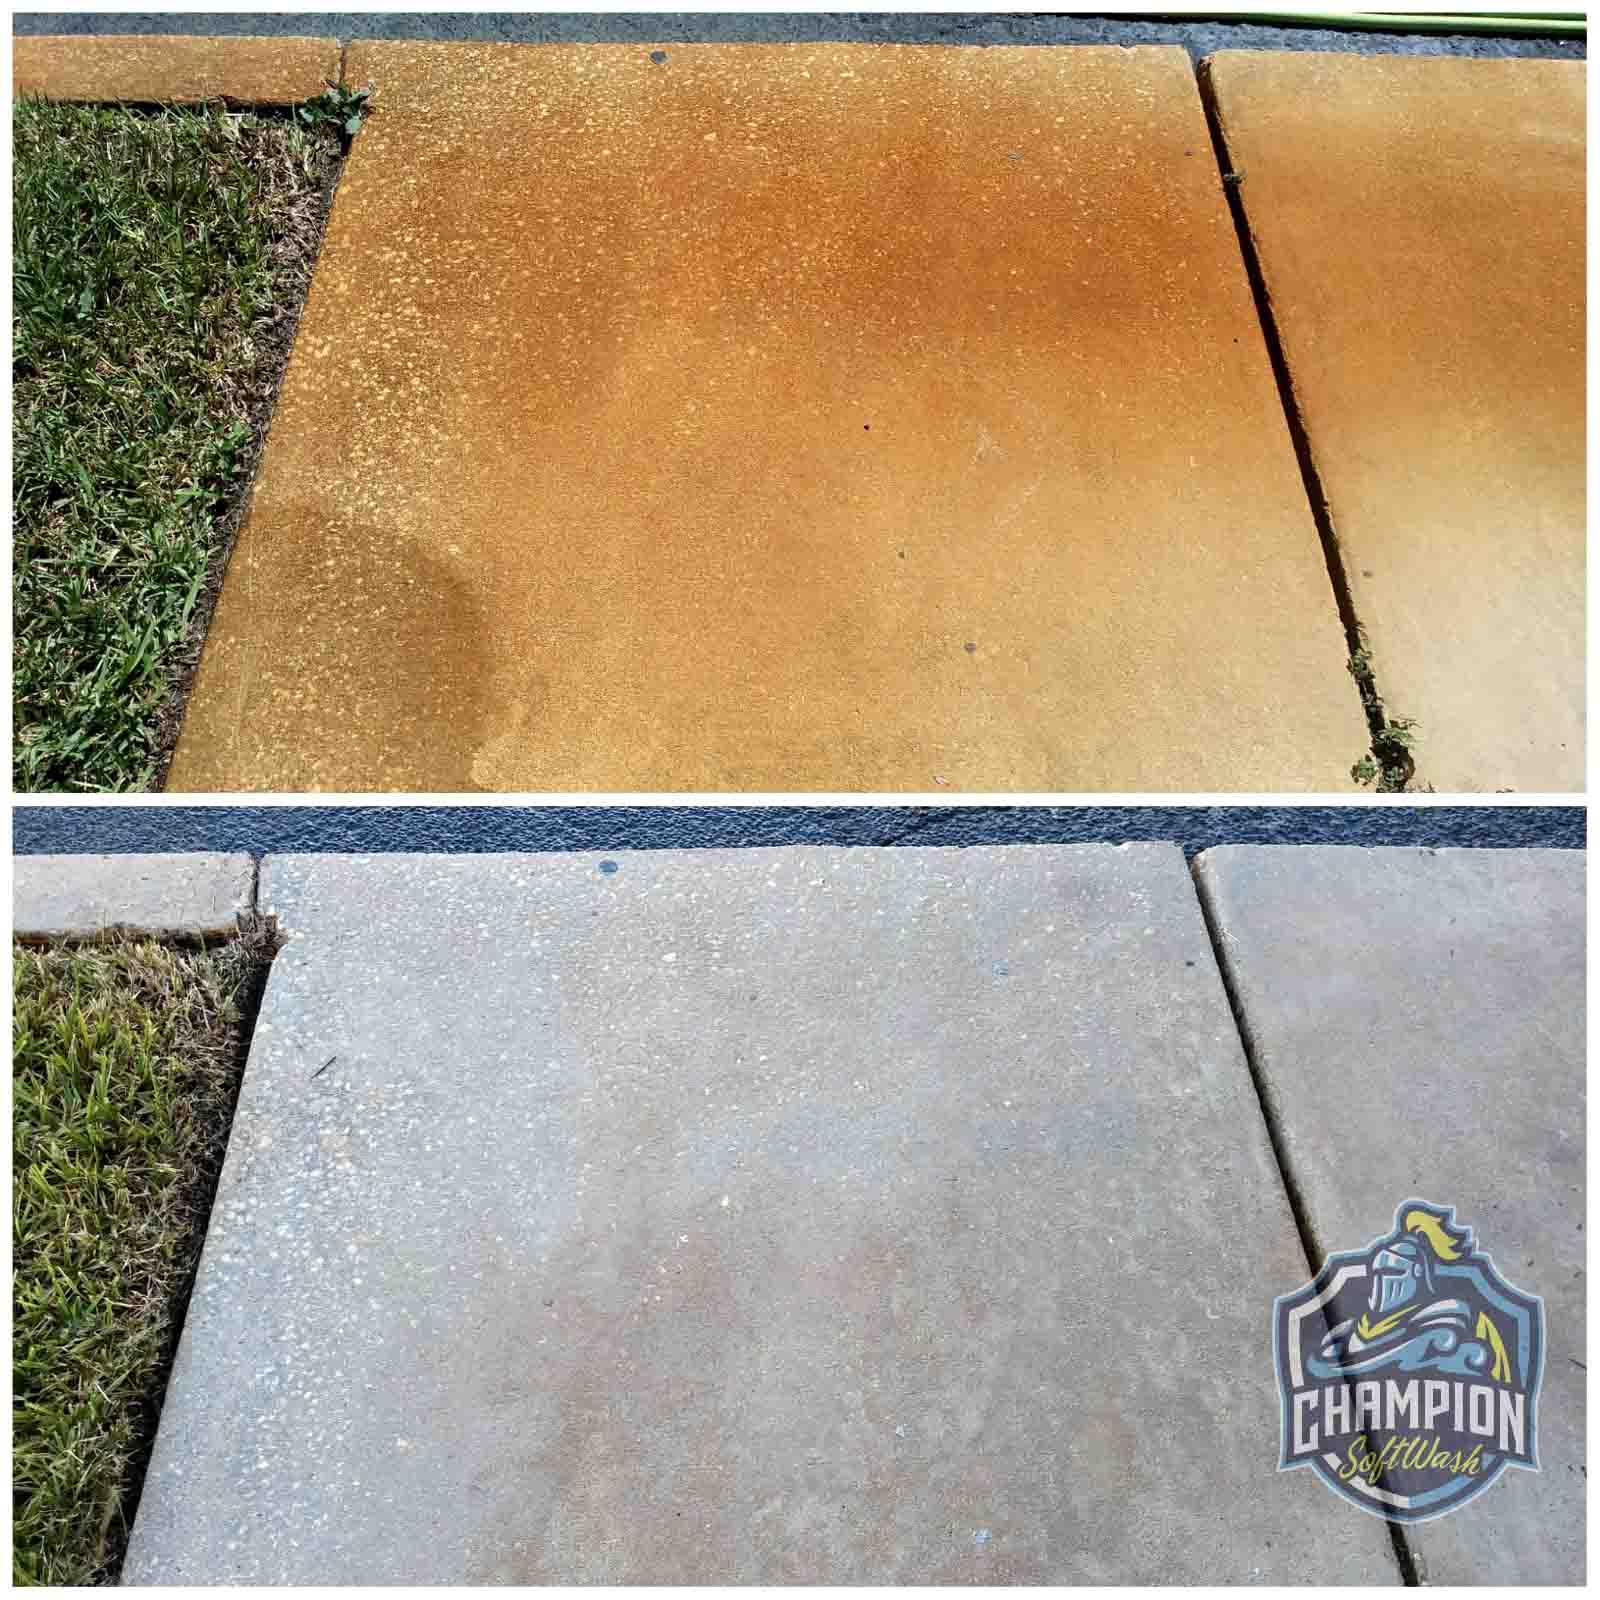 Irrigation iron rust removal on sidewalk in Altamonte Springs Florida